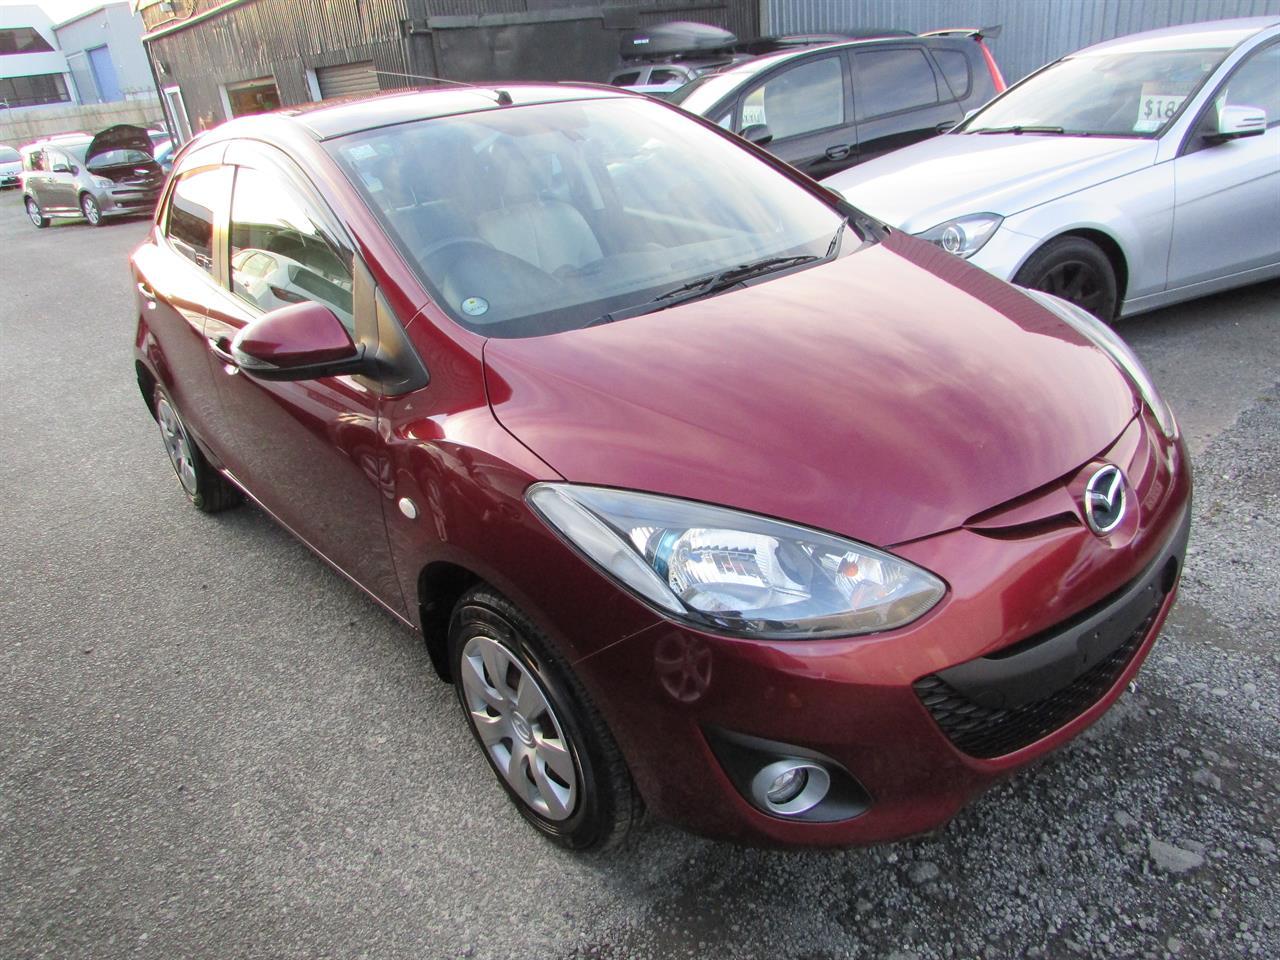 Motors Cars & parts Cars : 2012 Mazda Demio skyactive I-STOP Camchain engine 1.3